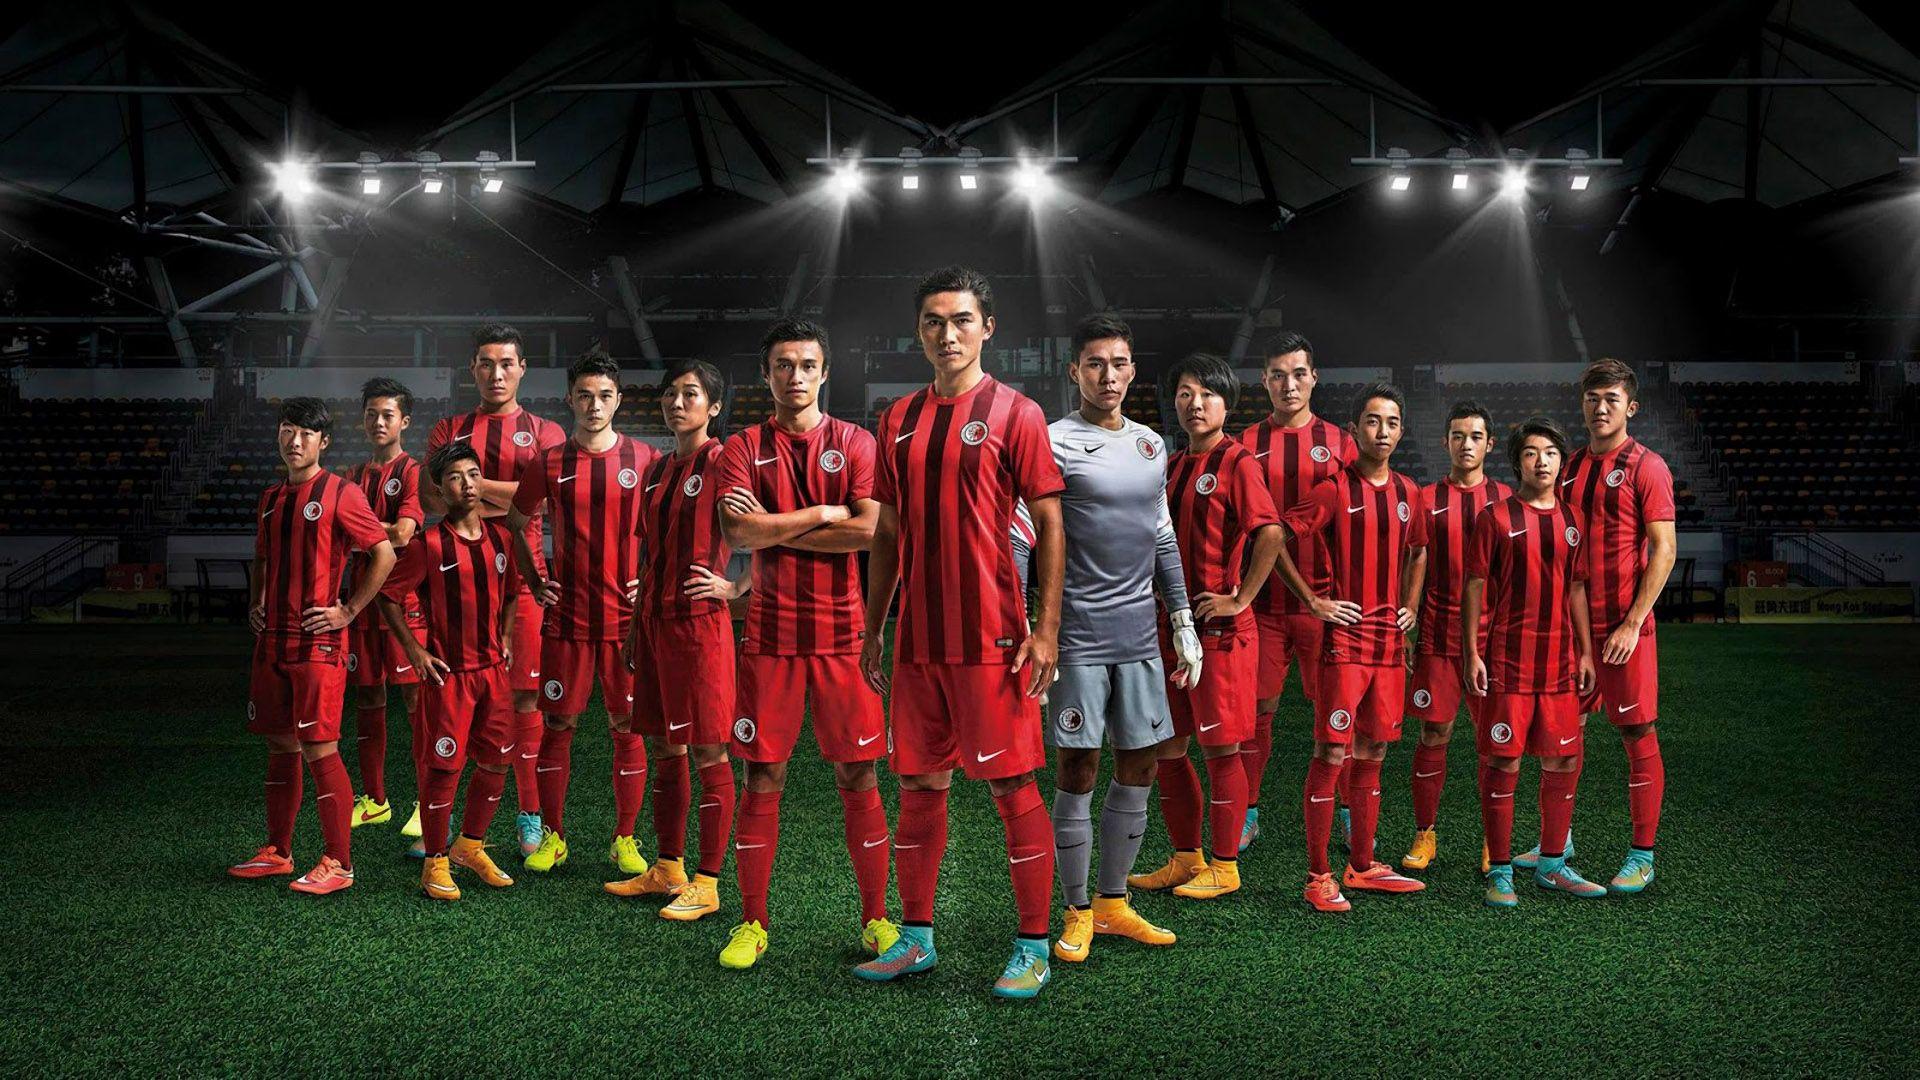 Football Wallpapers 2015 - Wallpaper Cave